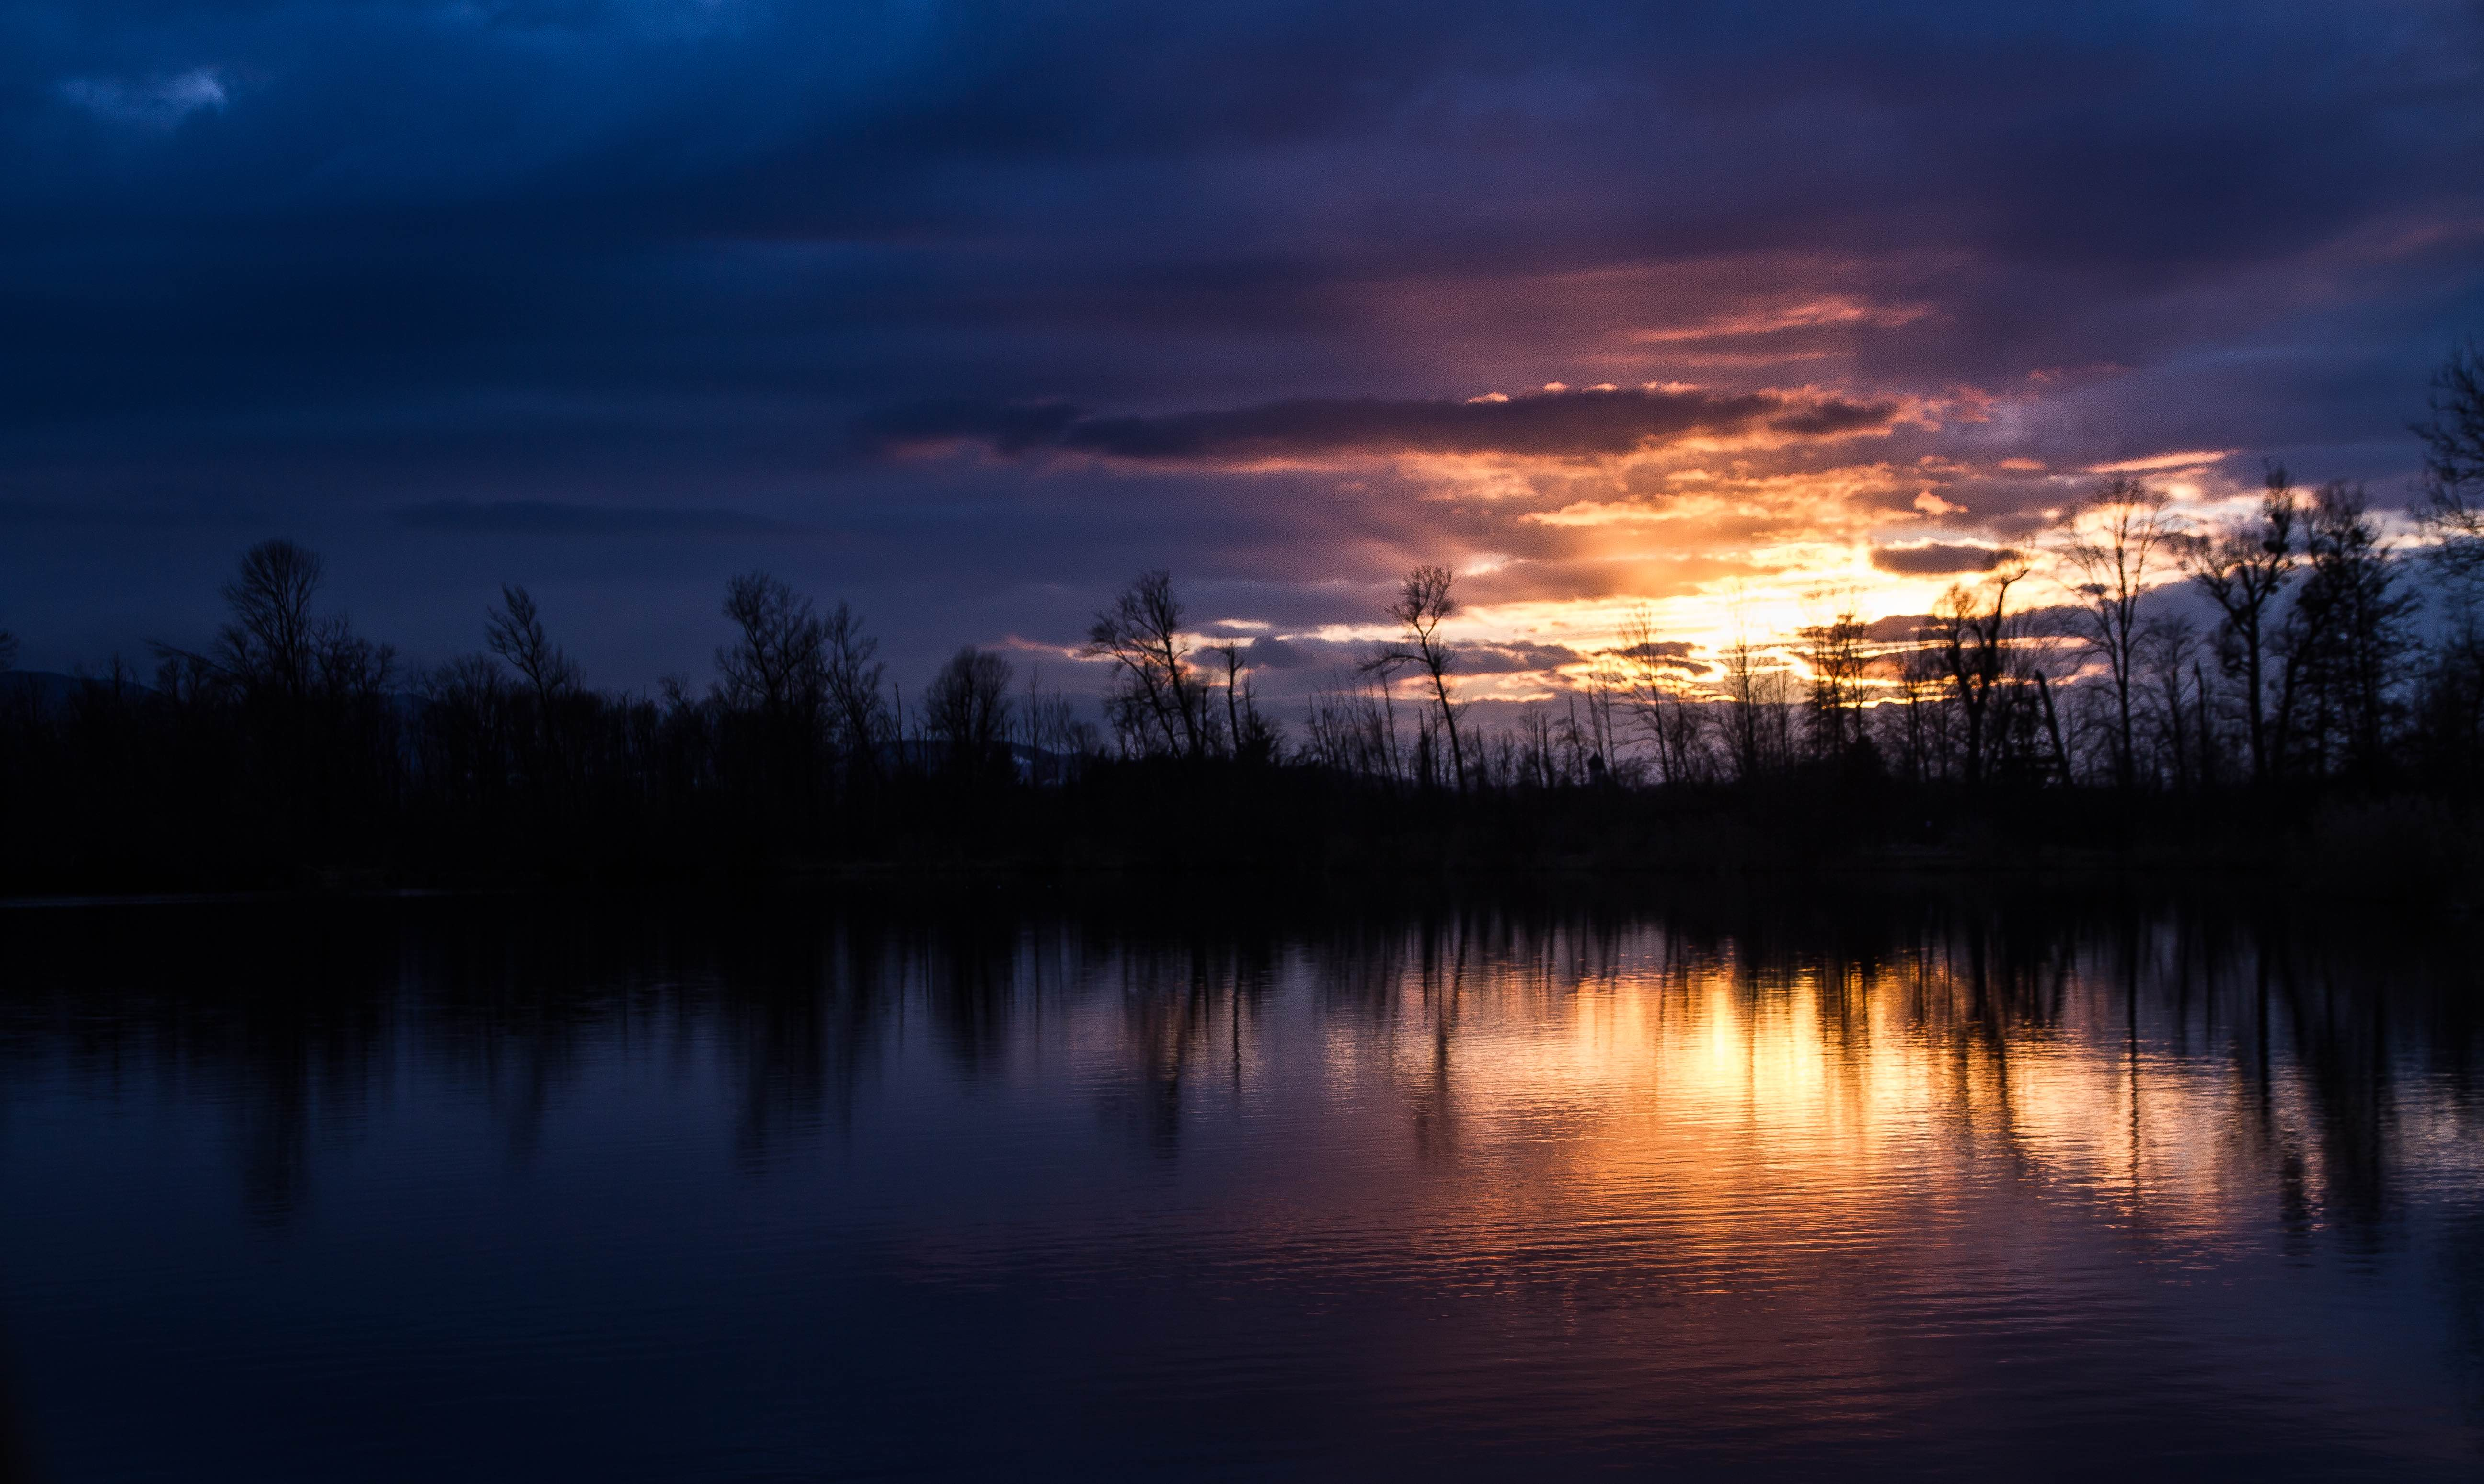 Happinger-Au See Sonnenuntergang Klein